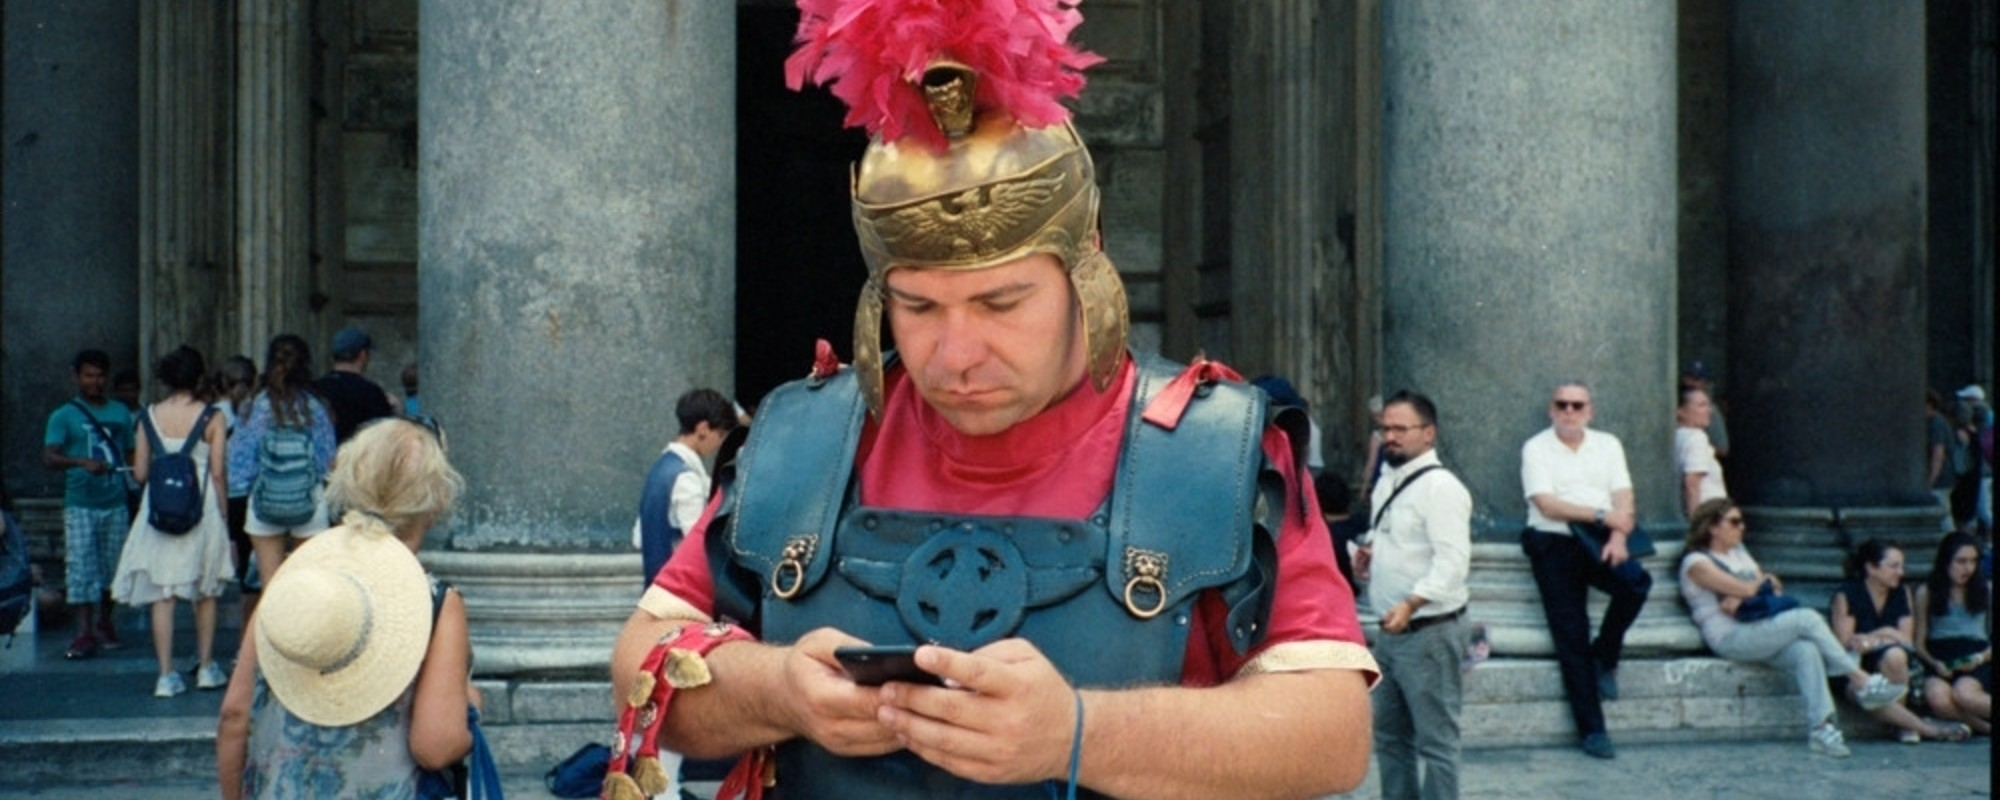 Os Profanos Paus de Selfie de Roma